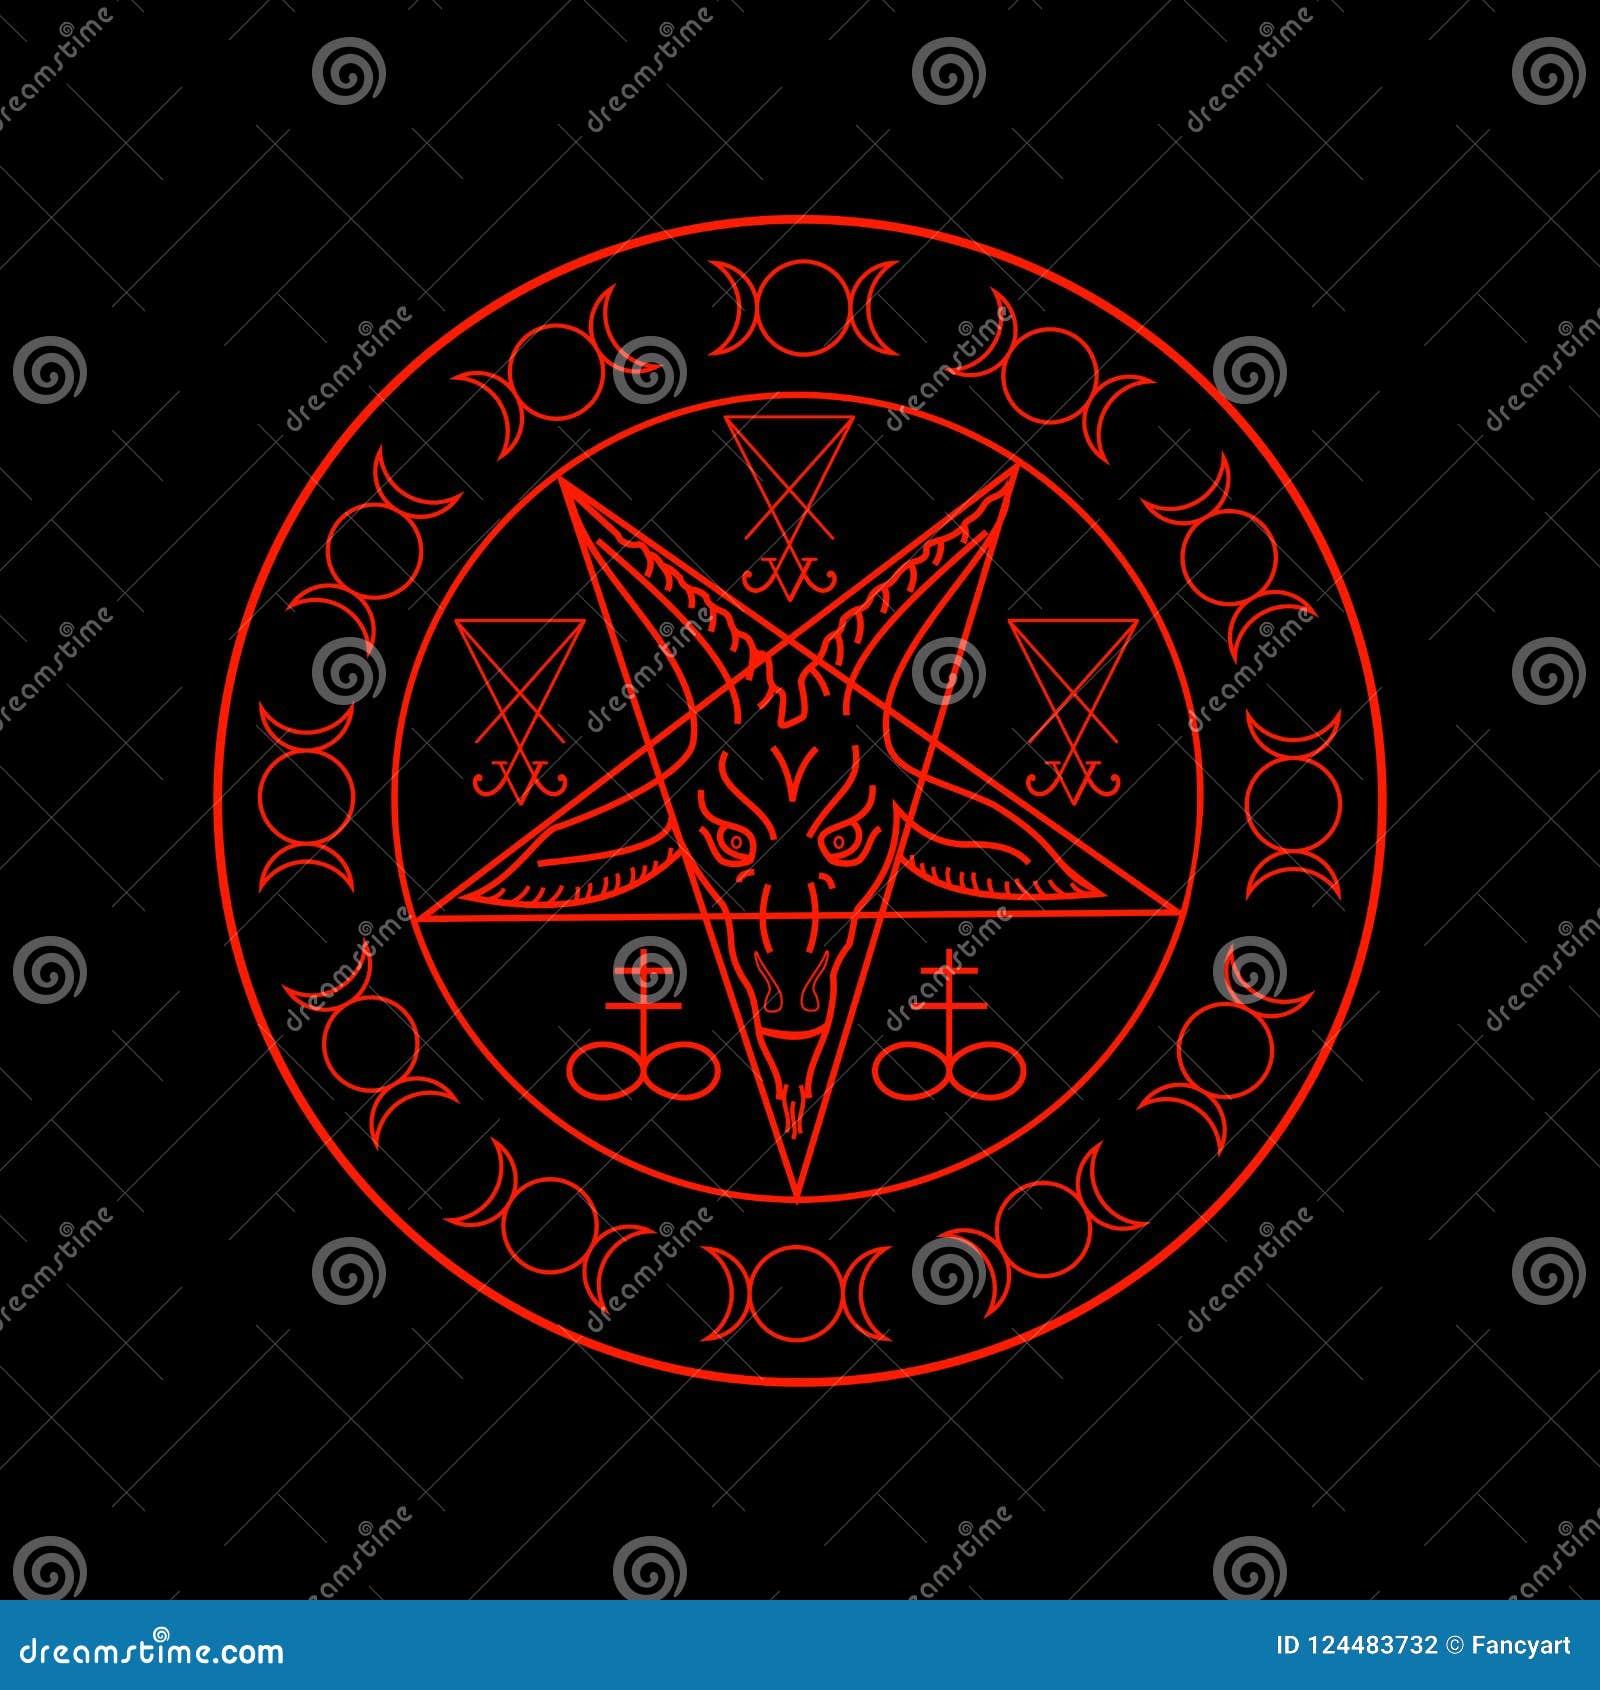 Cross Of Sulfur Triple Goddess Sigil Of Baphomet And Lucifer Stock